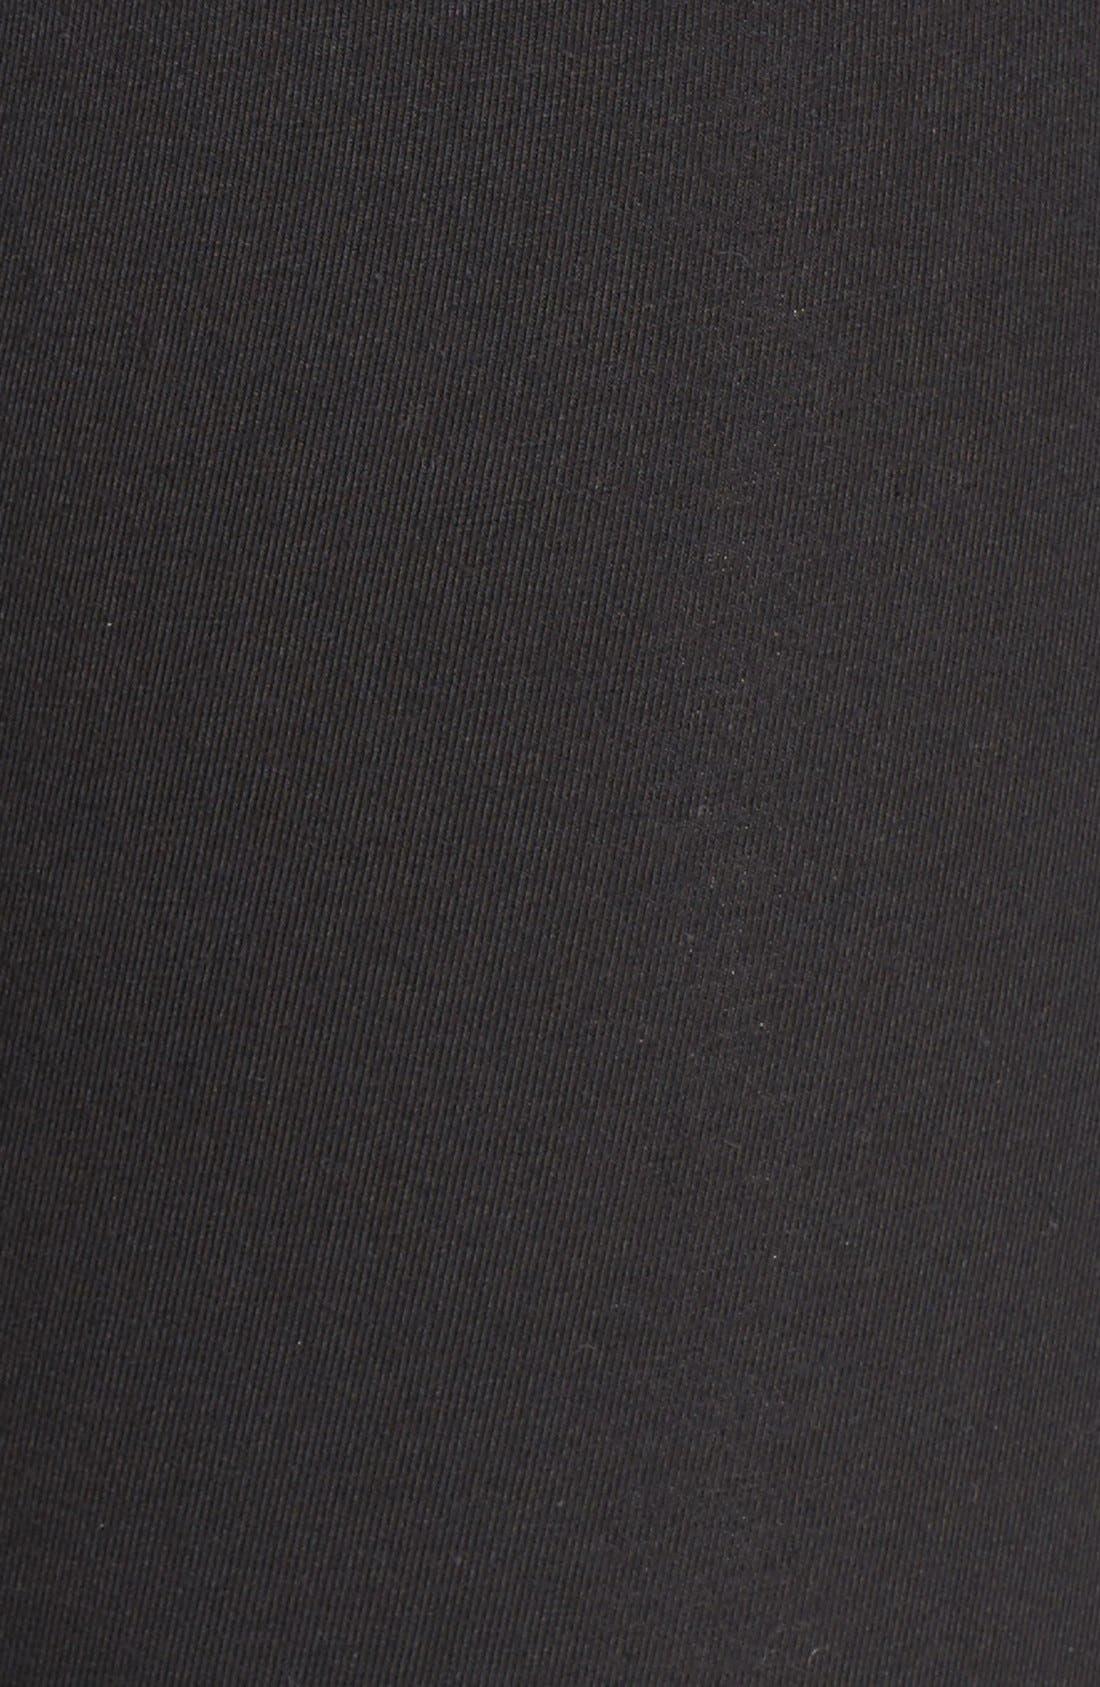 Alternate Image 5  - Nordstrom Go-To Leggings (Plus Size)